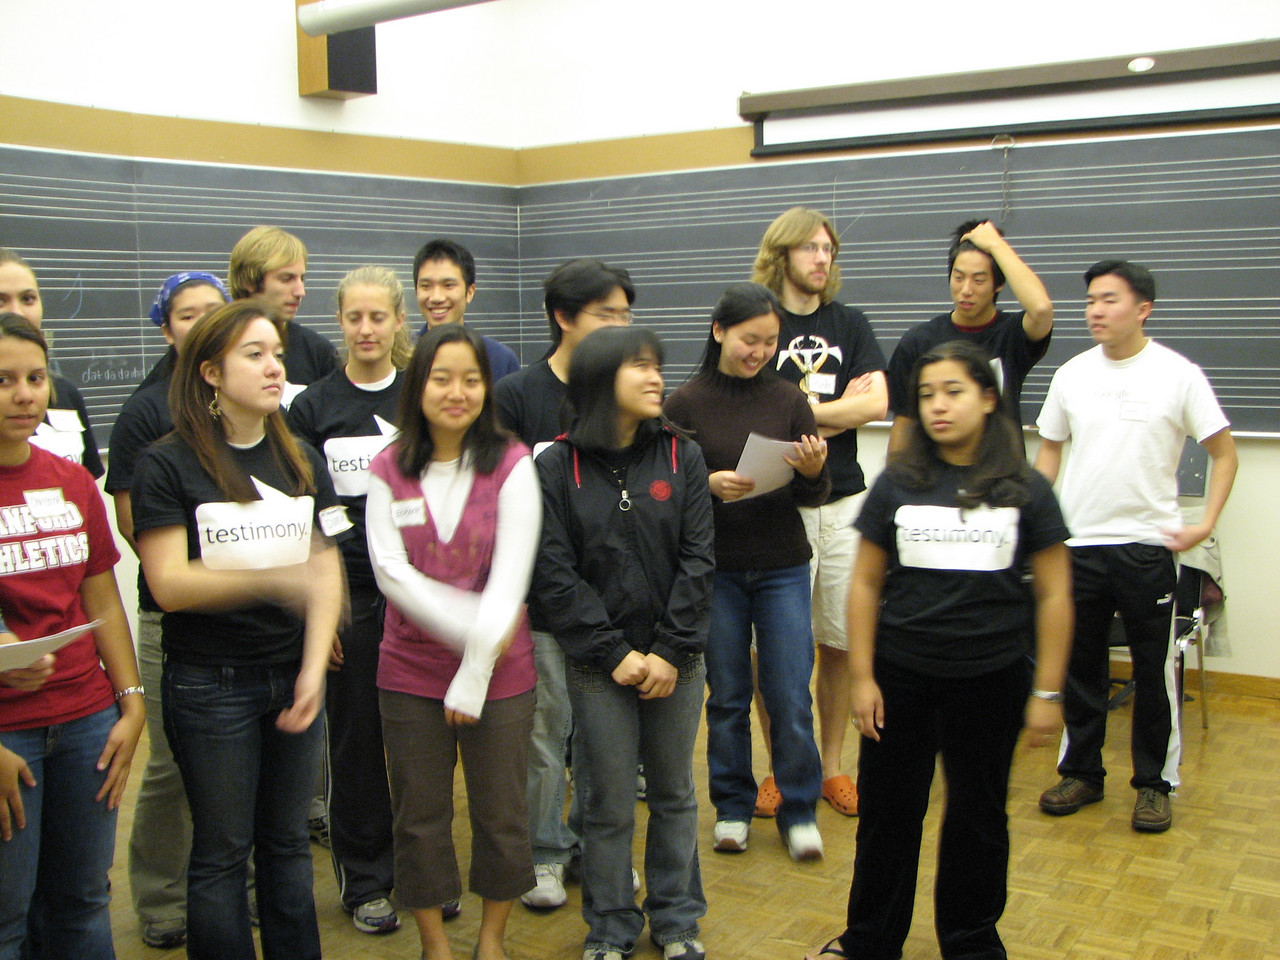 2006 12 02 Sat - Old Tmony practice 1